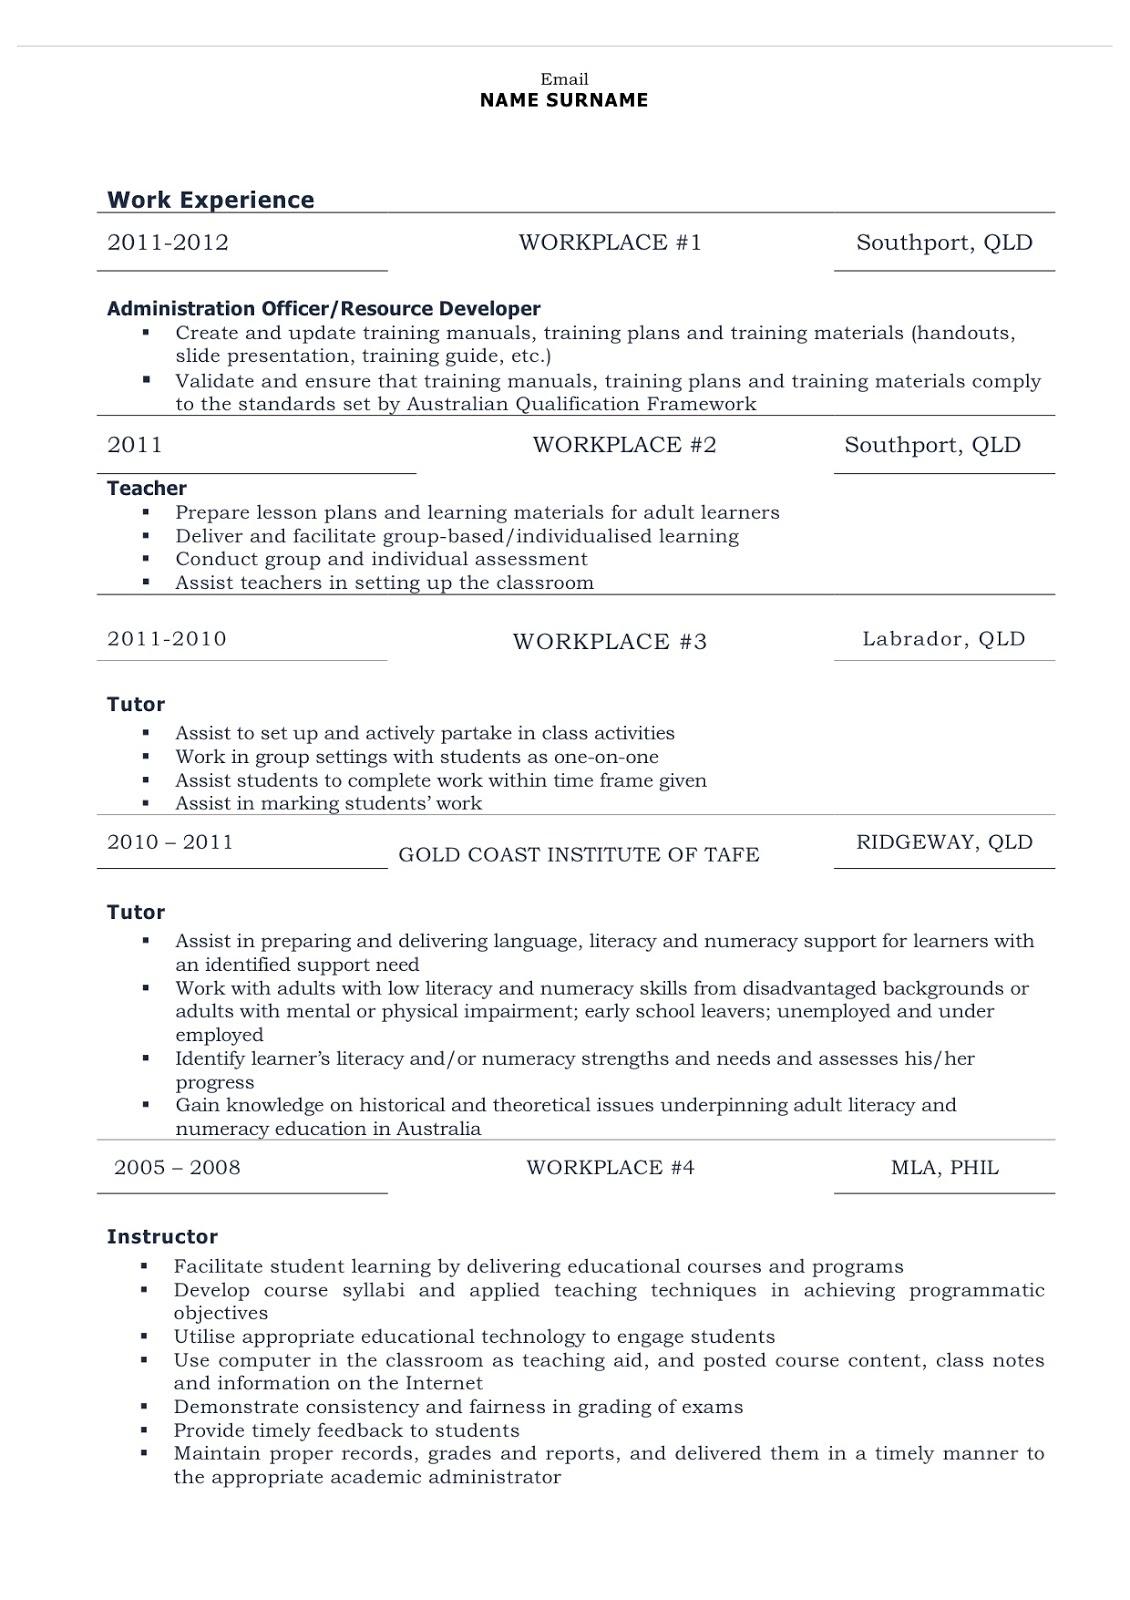 pin combination resume on pinterest